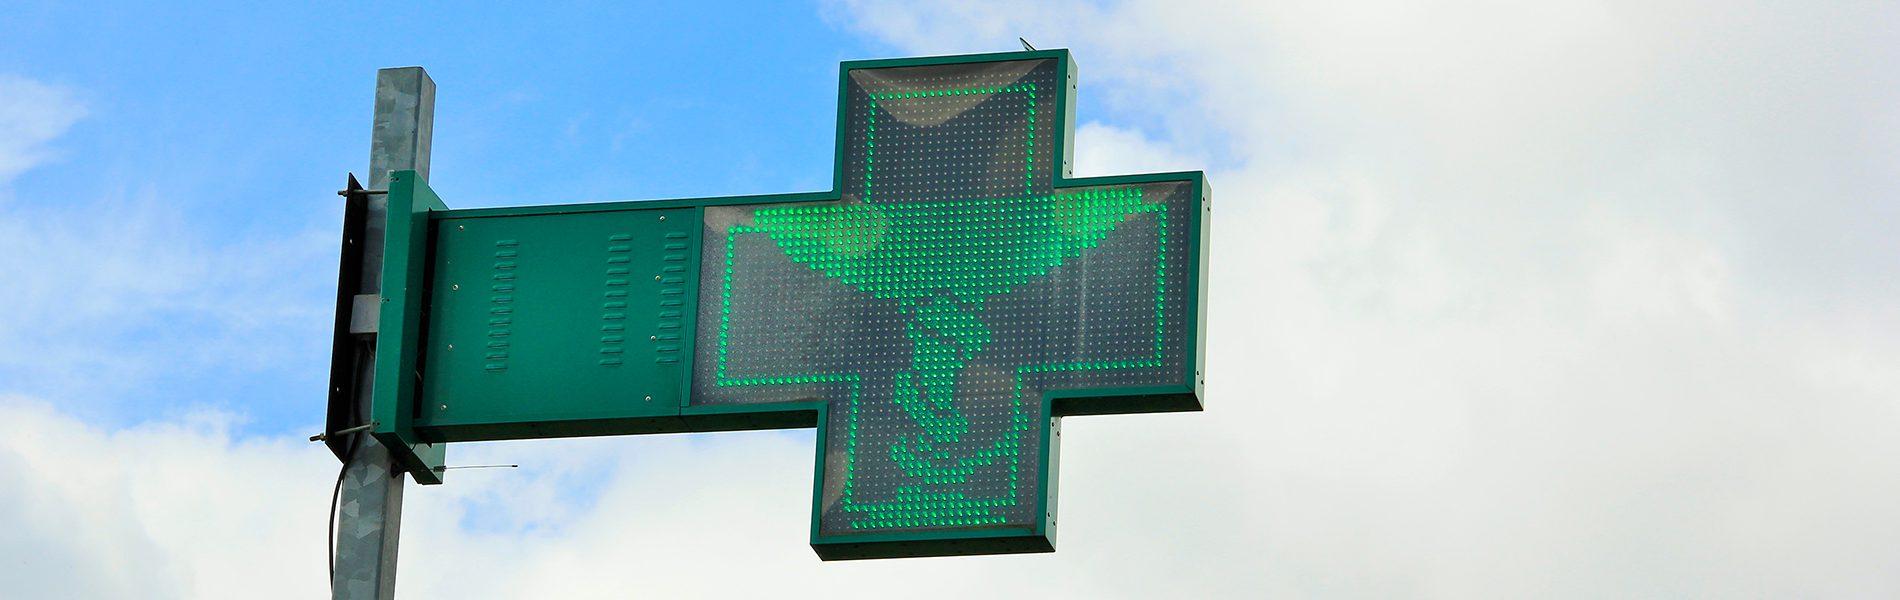 Pharmacie DES ARCADES - Image Homepage 3